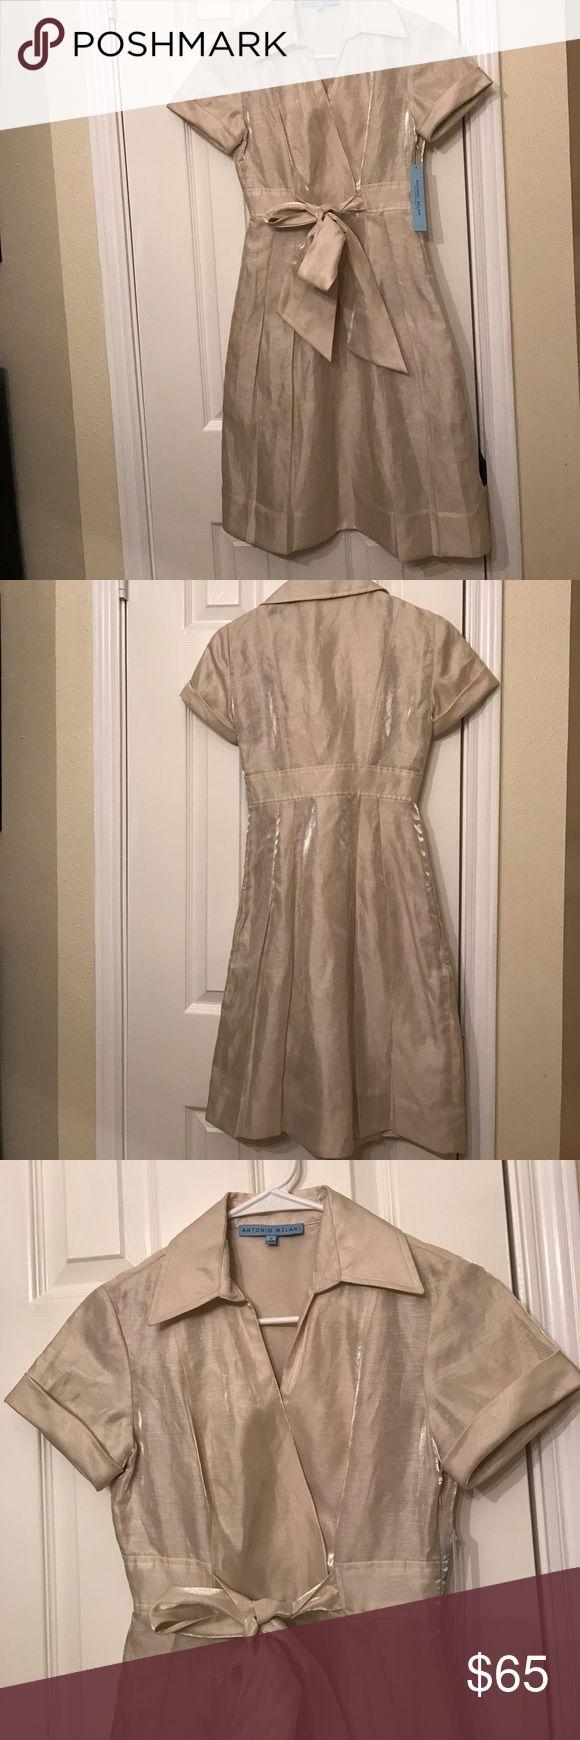 ❤NWT Antonio Melani❤ gorgeous Antonio Melani shirt dress. beautiful gold linen collared shirt dress. New with tags! 80% linen 20% nylon ANTONIO MELANI Dresses